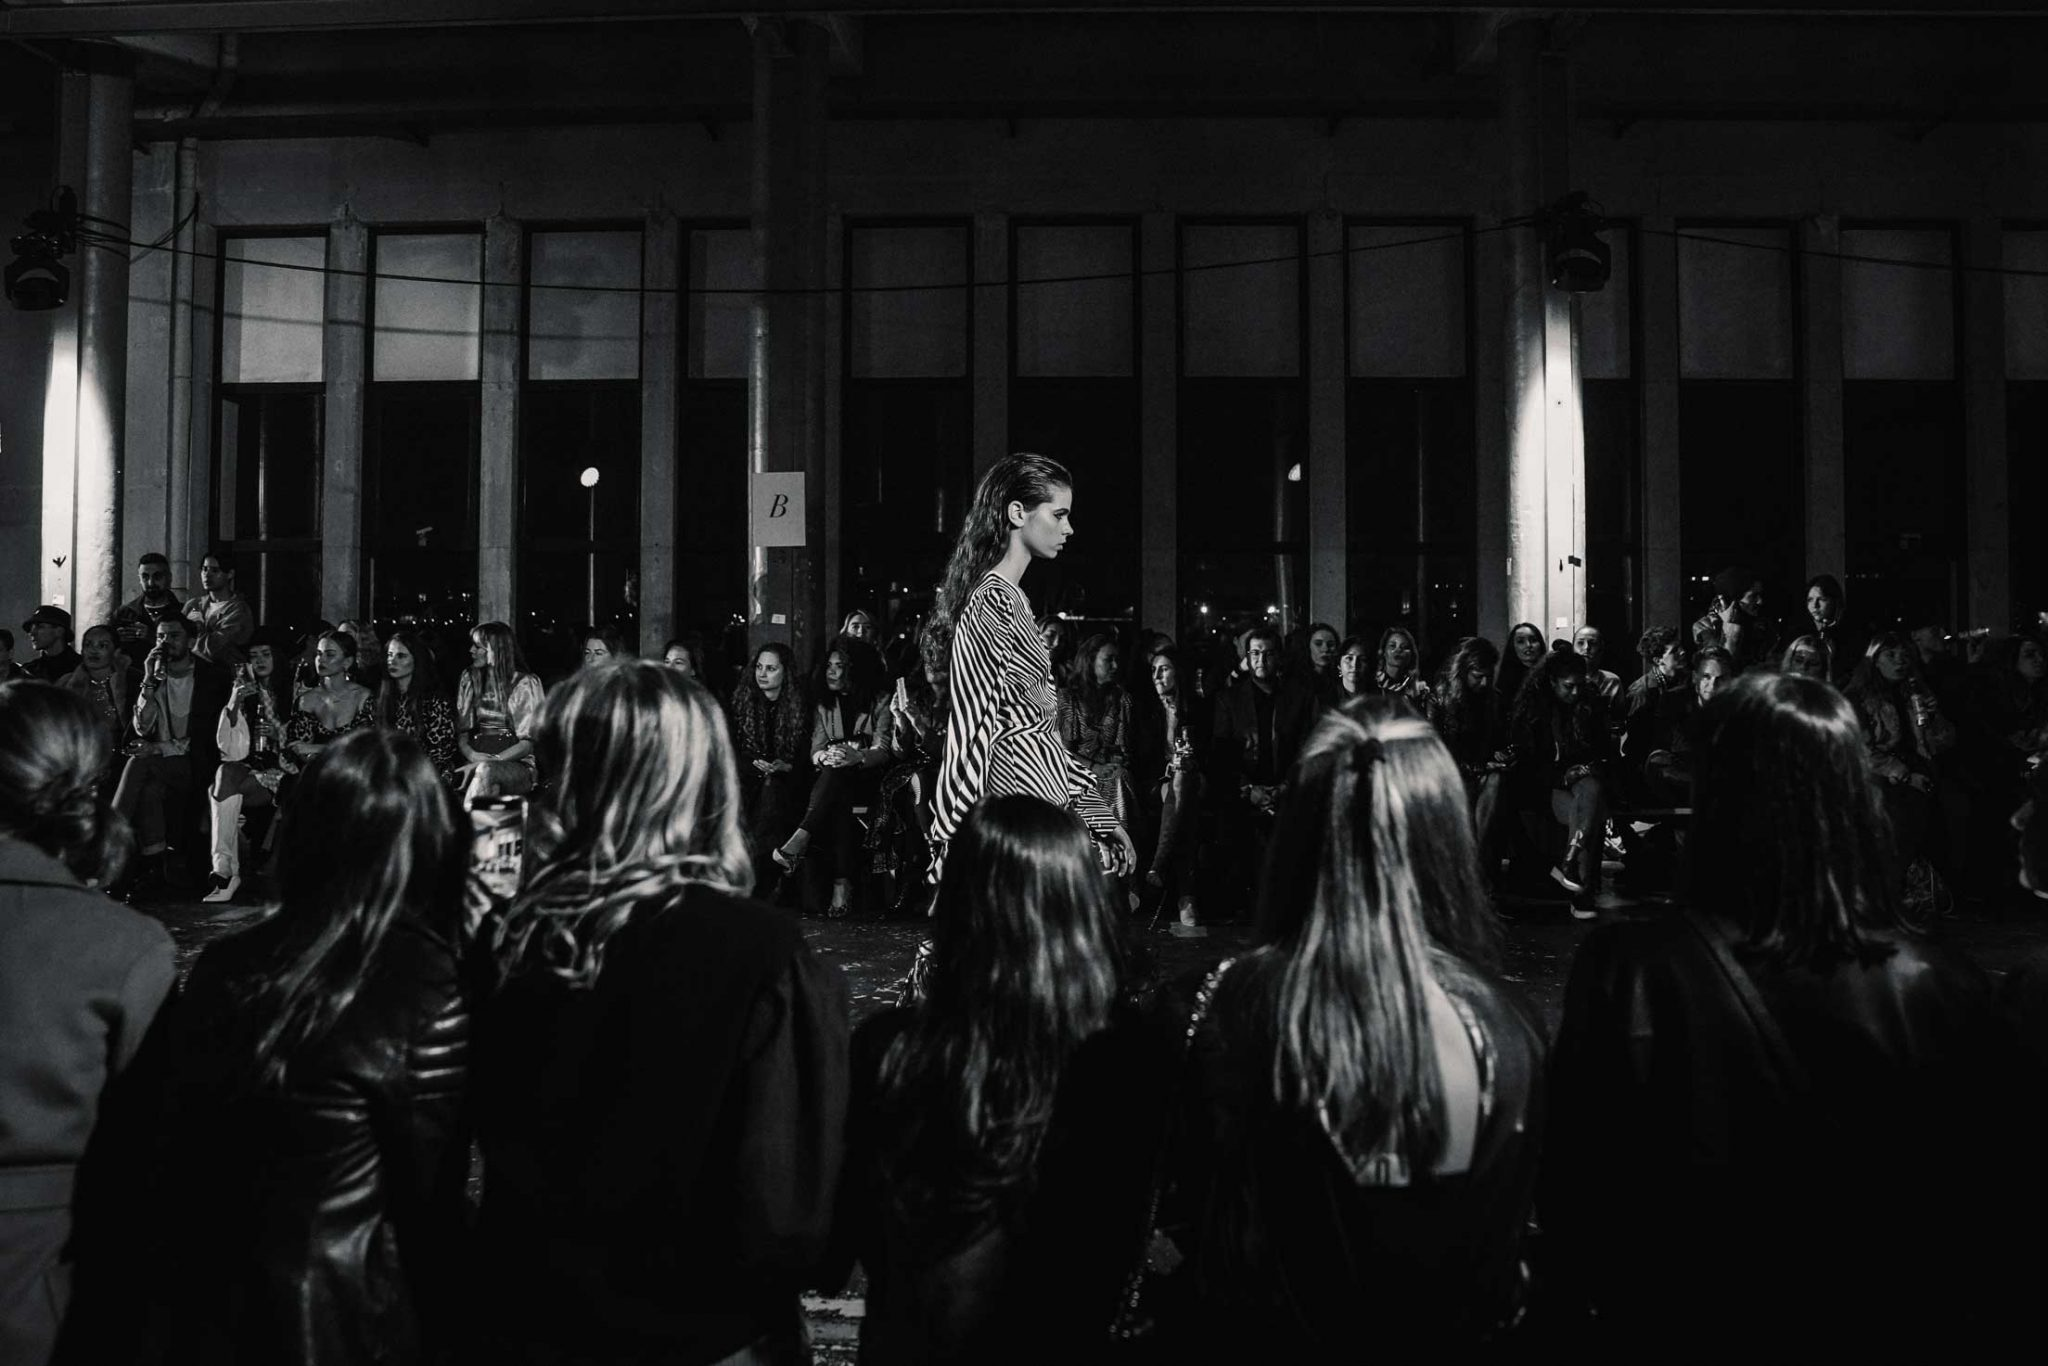 Ilsoo_van_Dijk_Ilsoovandijk_AFW_Toral_Backstage_Amsterdam_Fashion_week_2020_-scaled_21